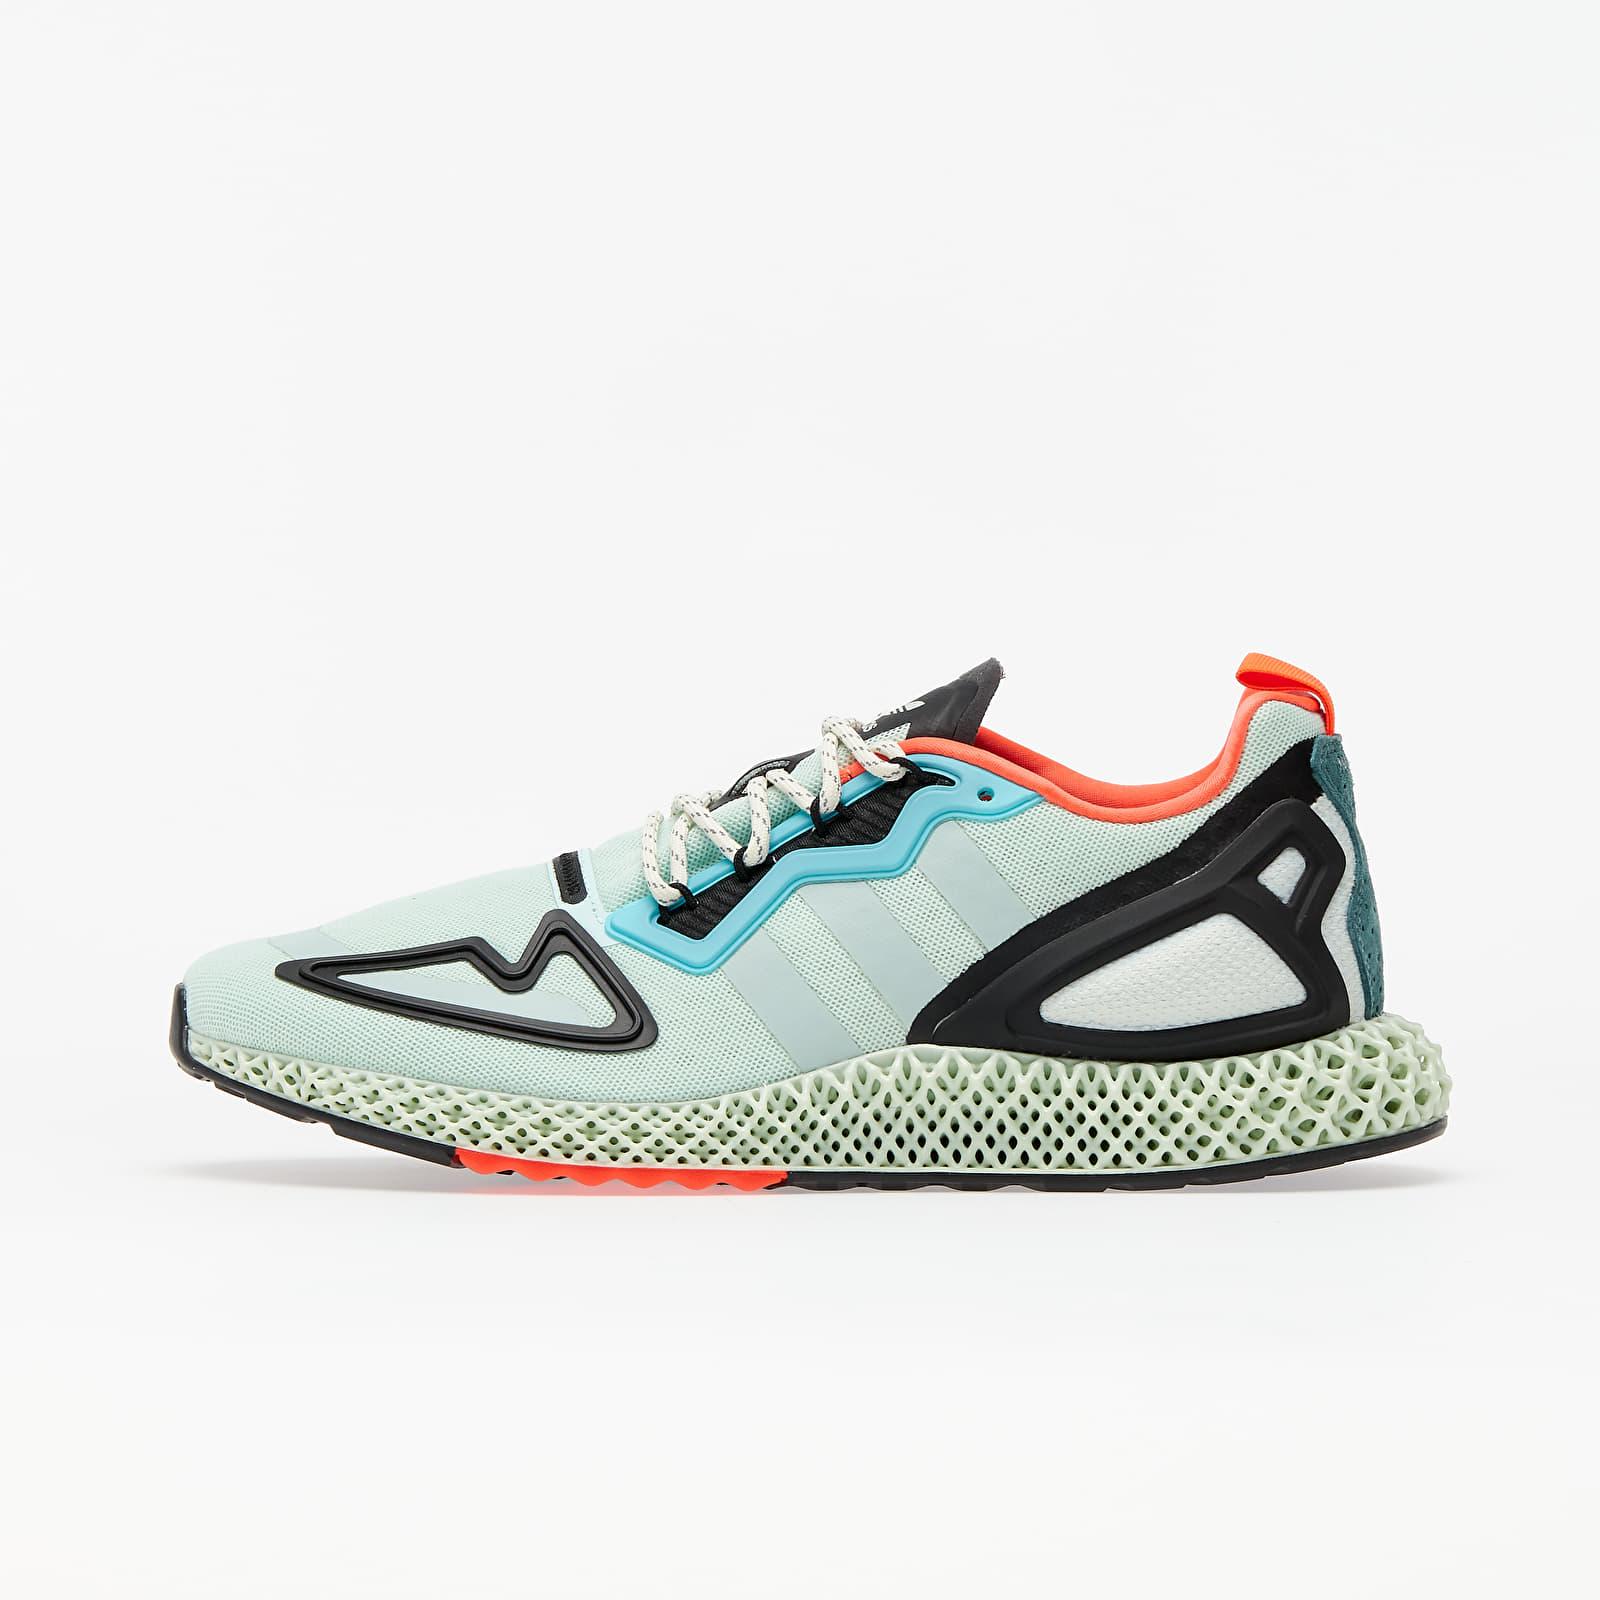 Men's shoes adidas ZX 2K 4D Dash Green/ Green Tint/ Raw Green